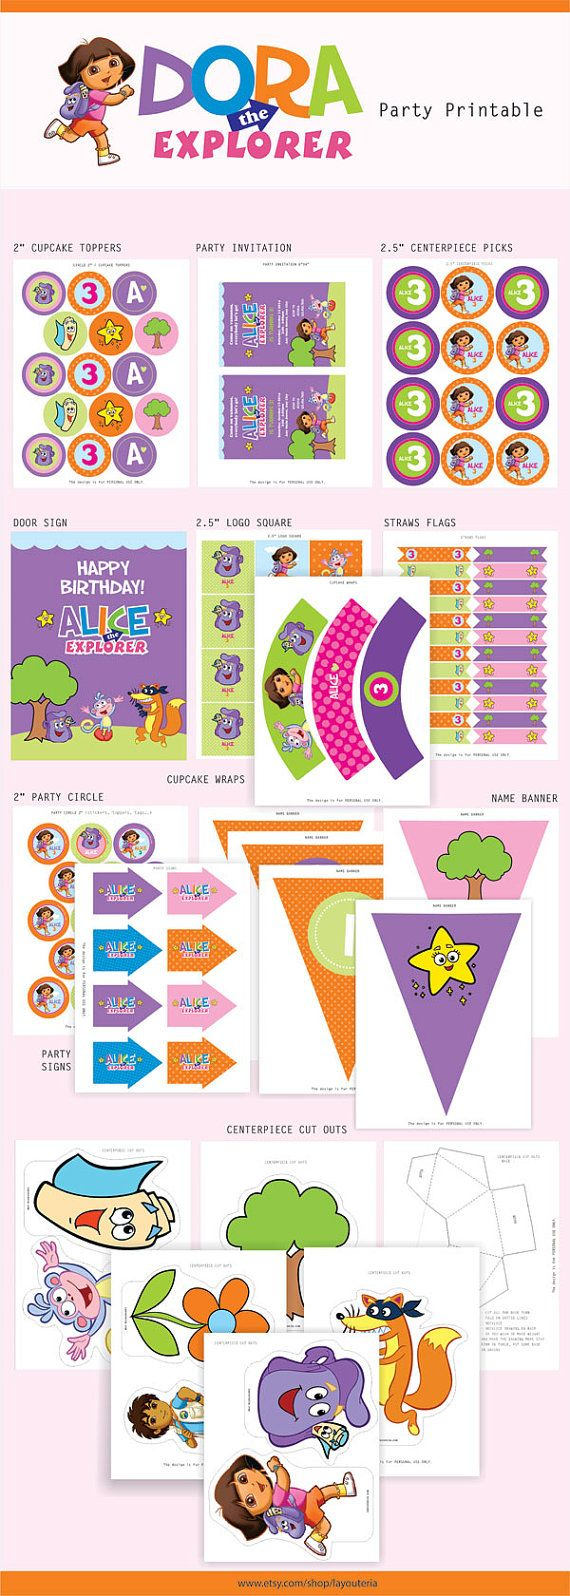 Dora the Explorer Birthday Dora the Explorer Party by Layouteria